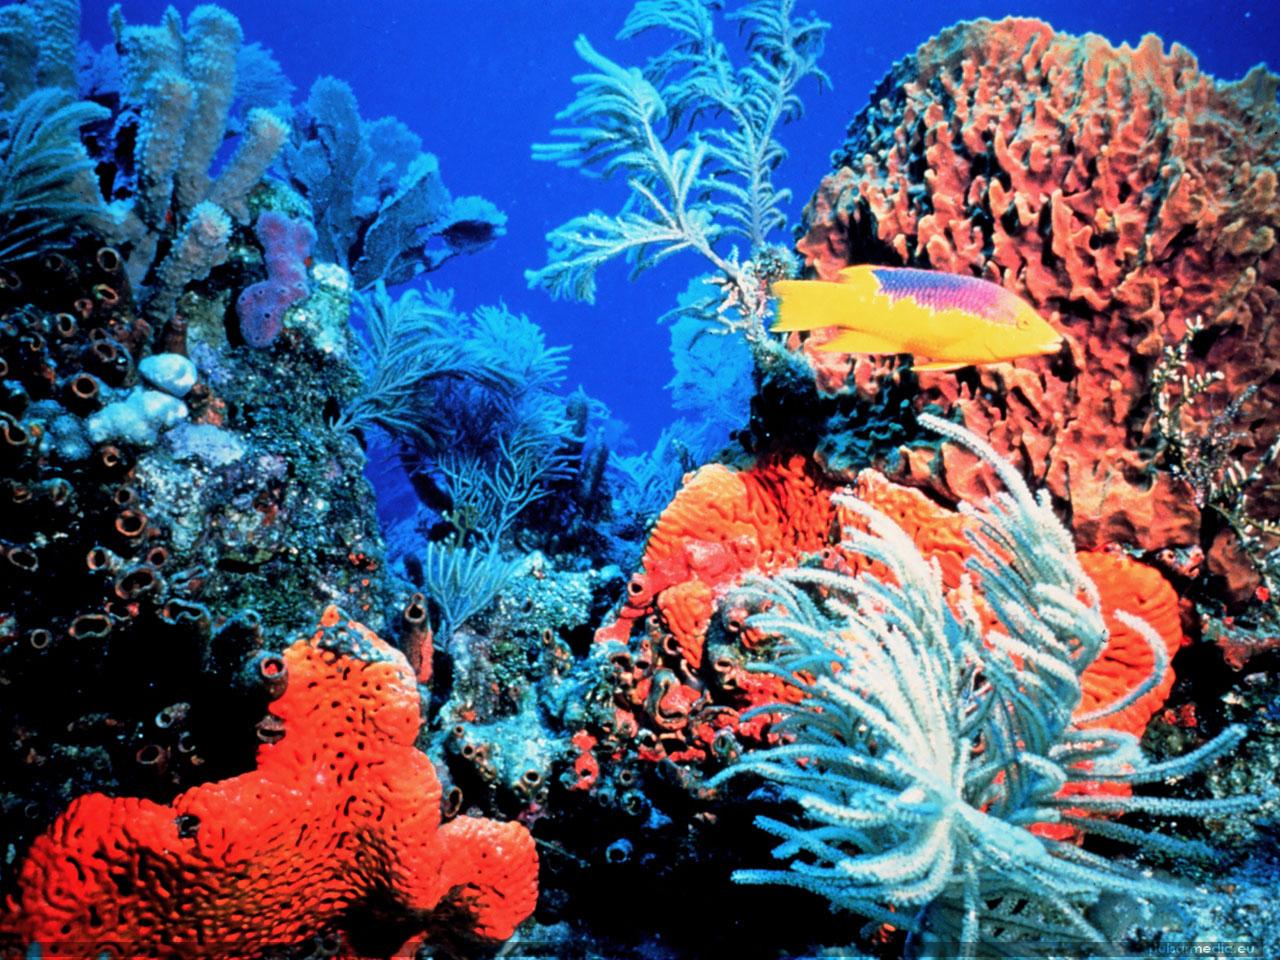 Coral Reef Florida Keys Ocean Life 11280x960 Deluxe Wallpaper Ocean 1280x960